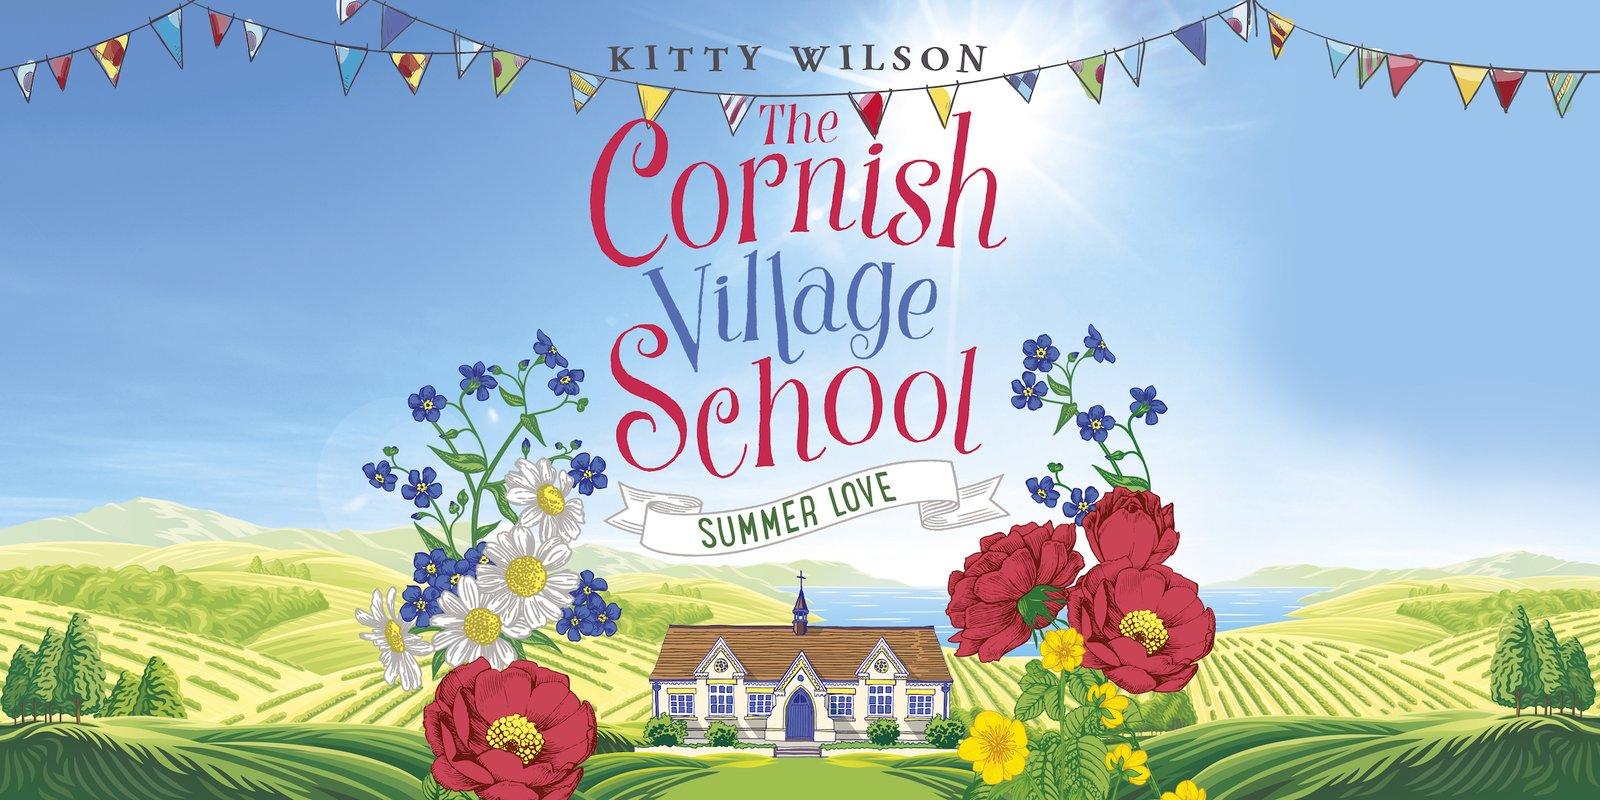 The Cornish Village School - Summer Love | Canelo